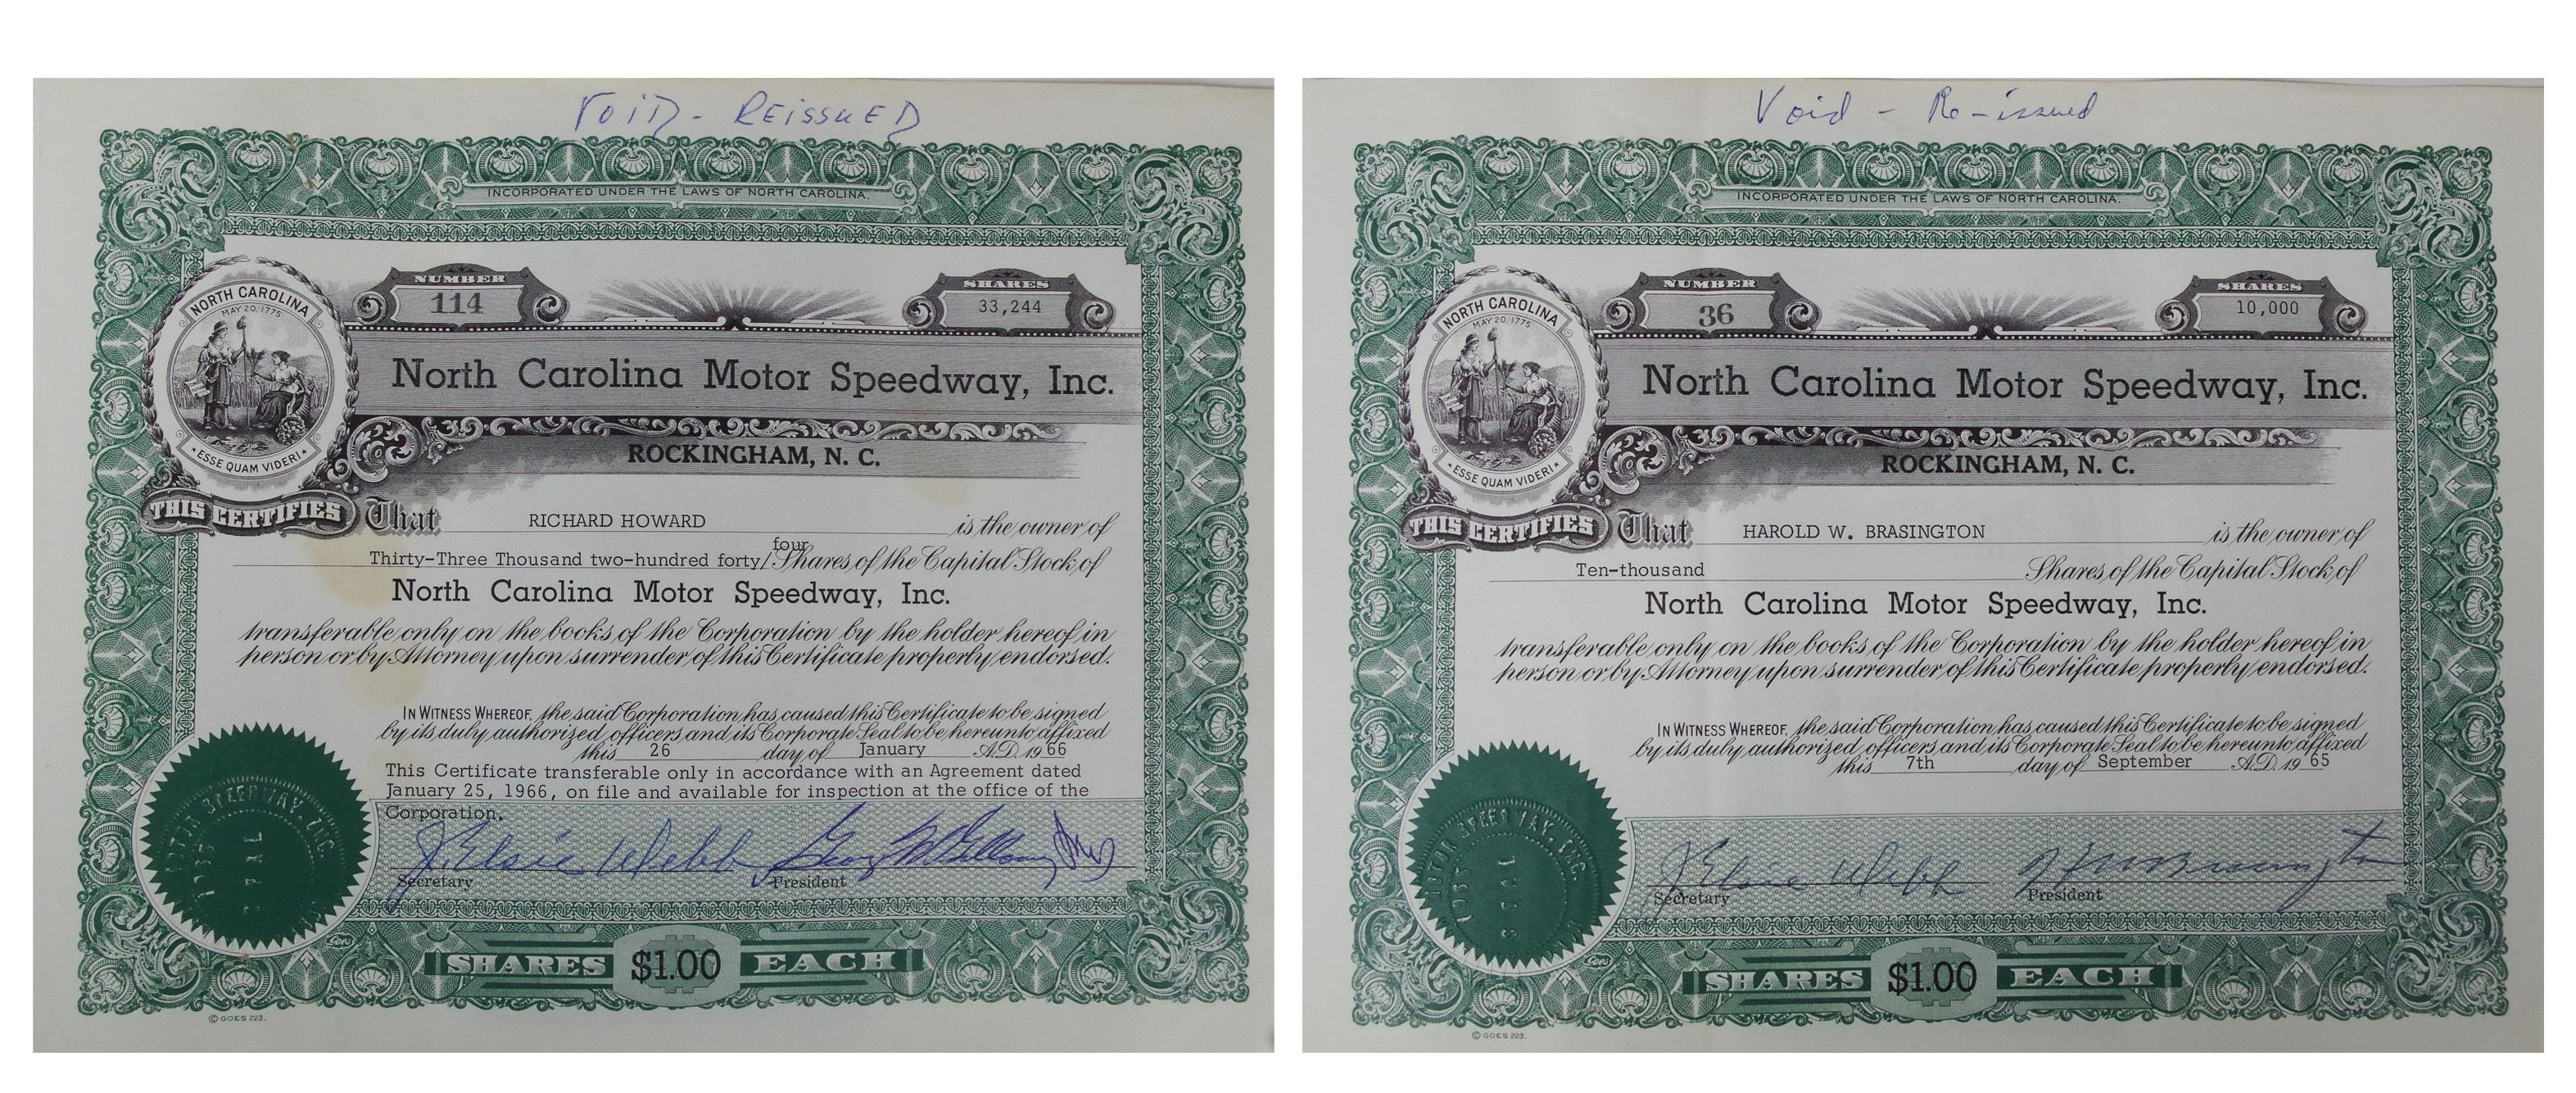 Artifact: Investing in NASCAR and North Carolina